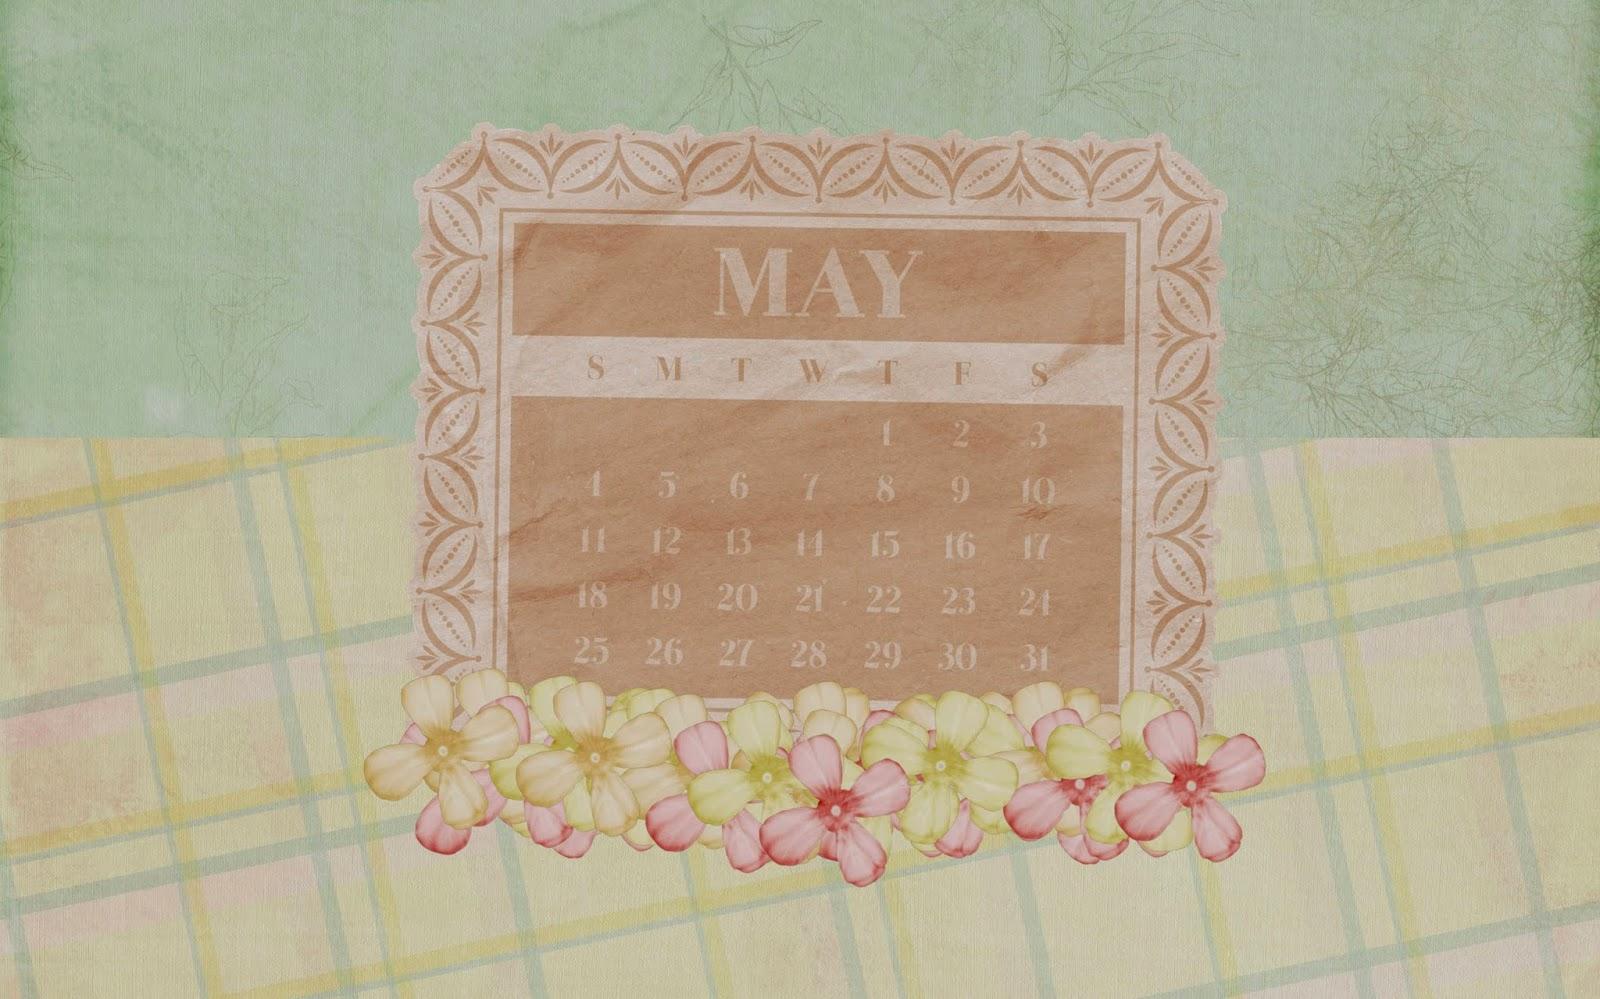 Desktop background with a calendar